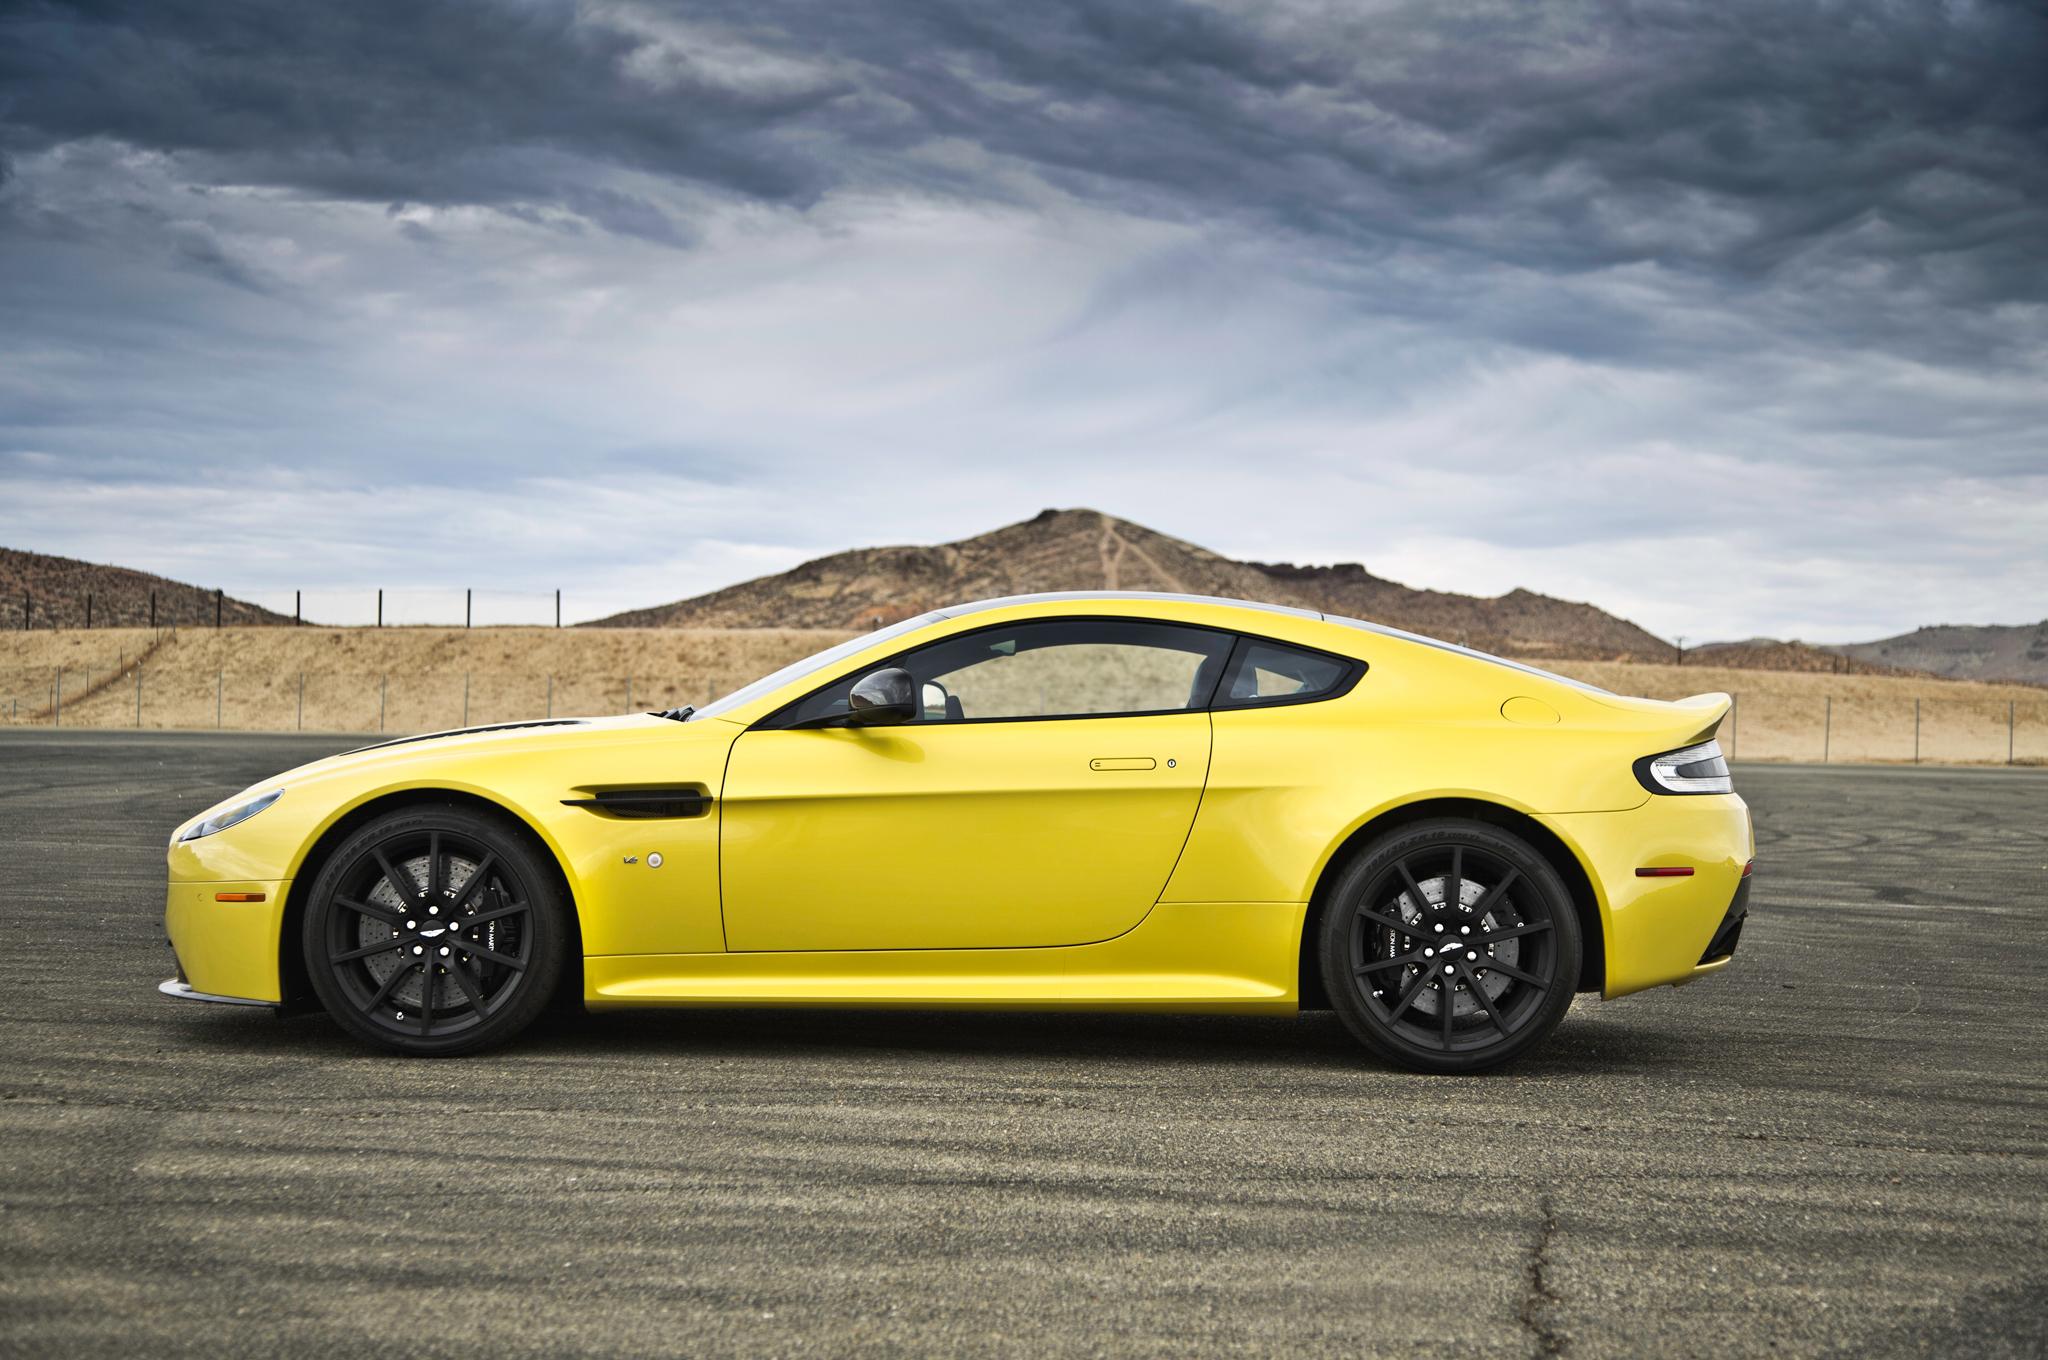 2015 Aston Martin V12 Vantage S Image 14